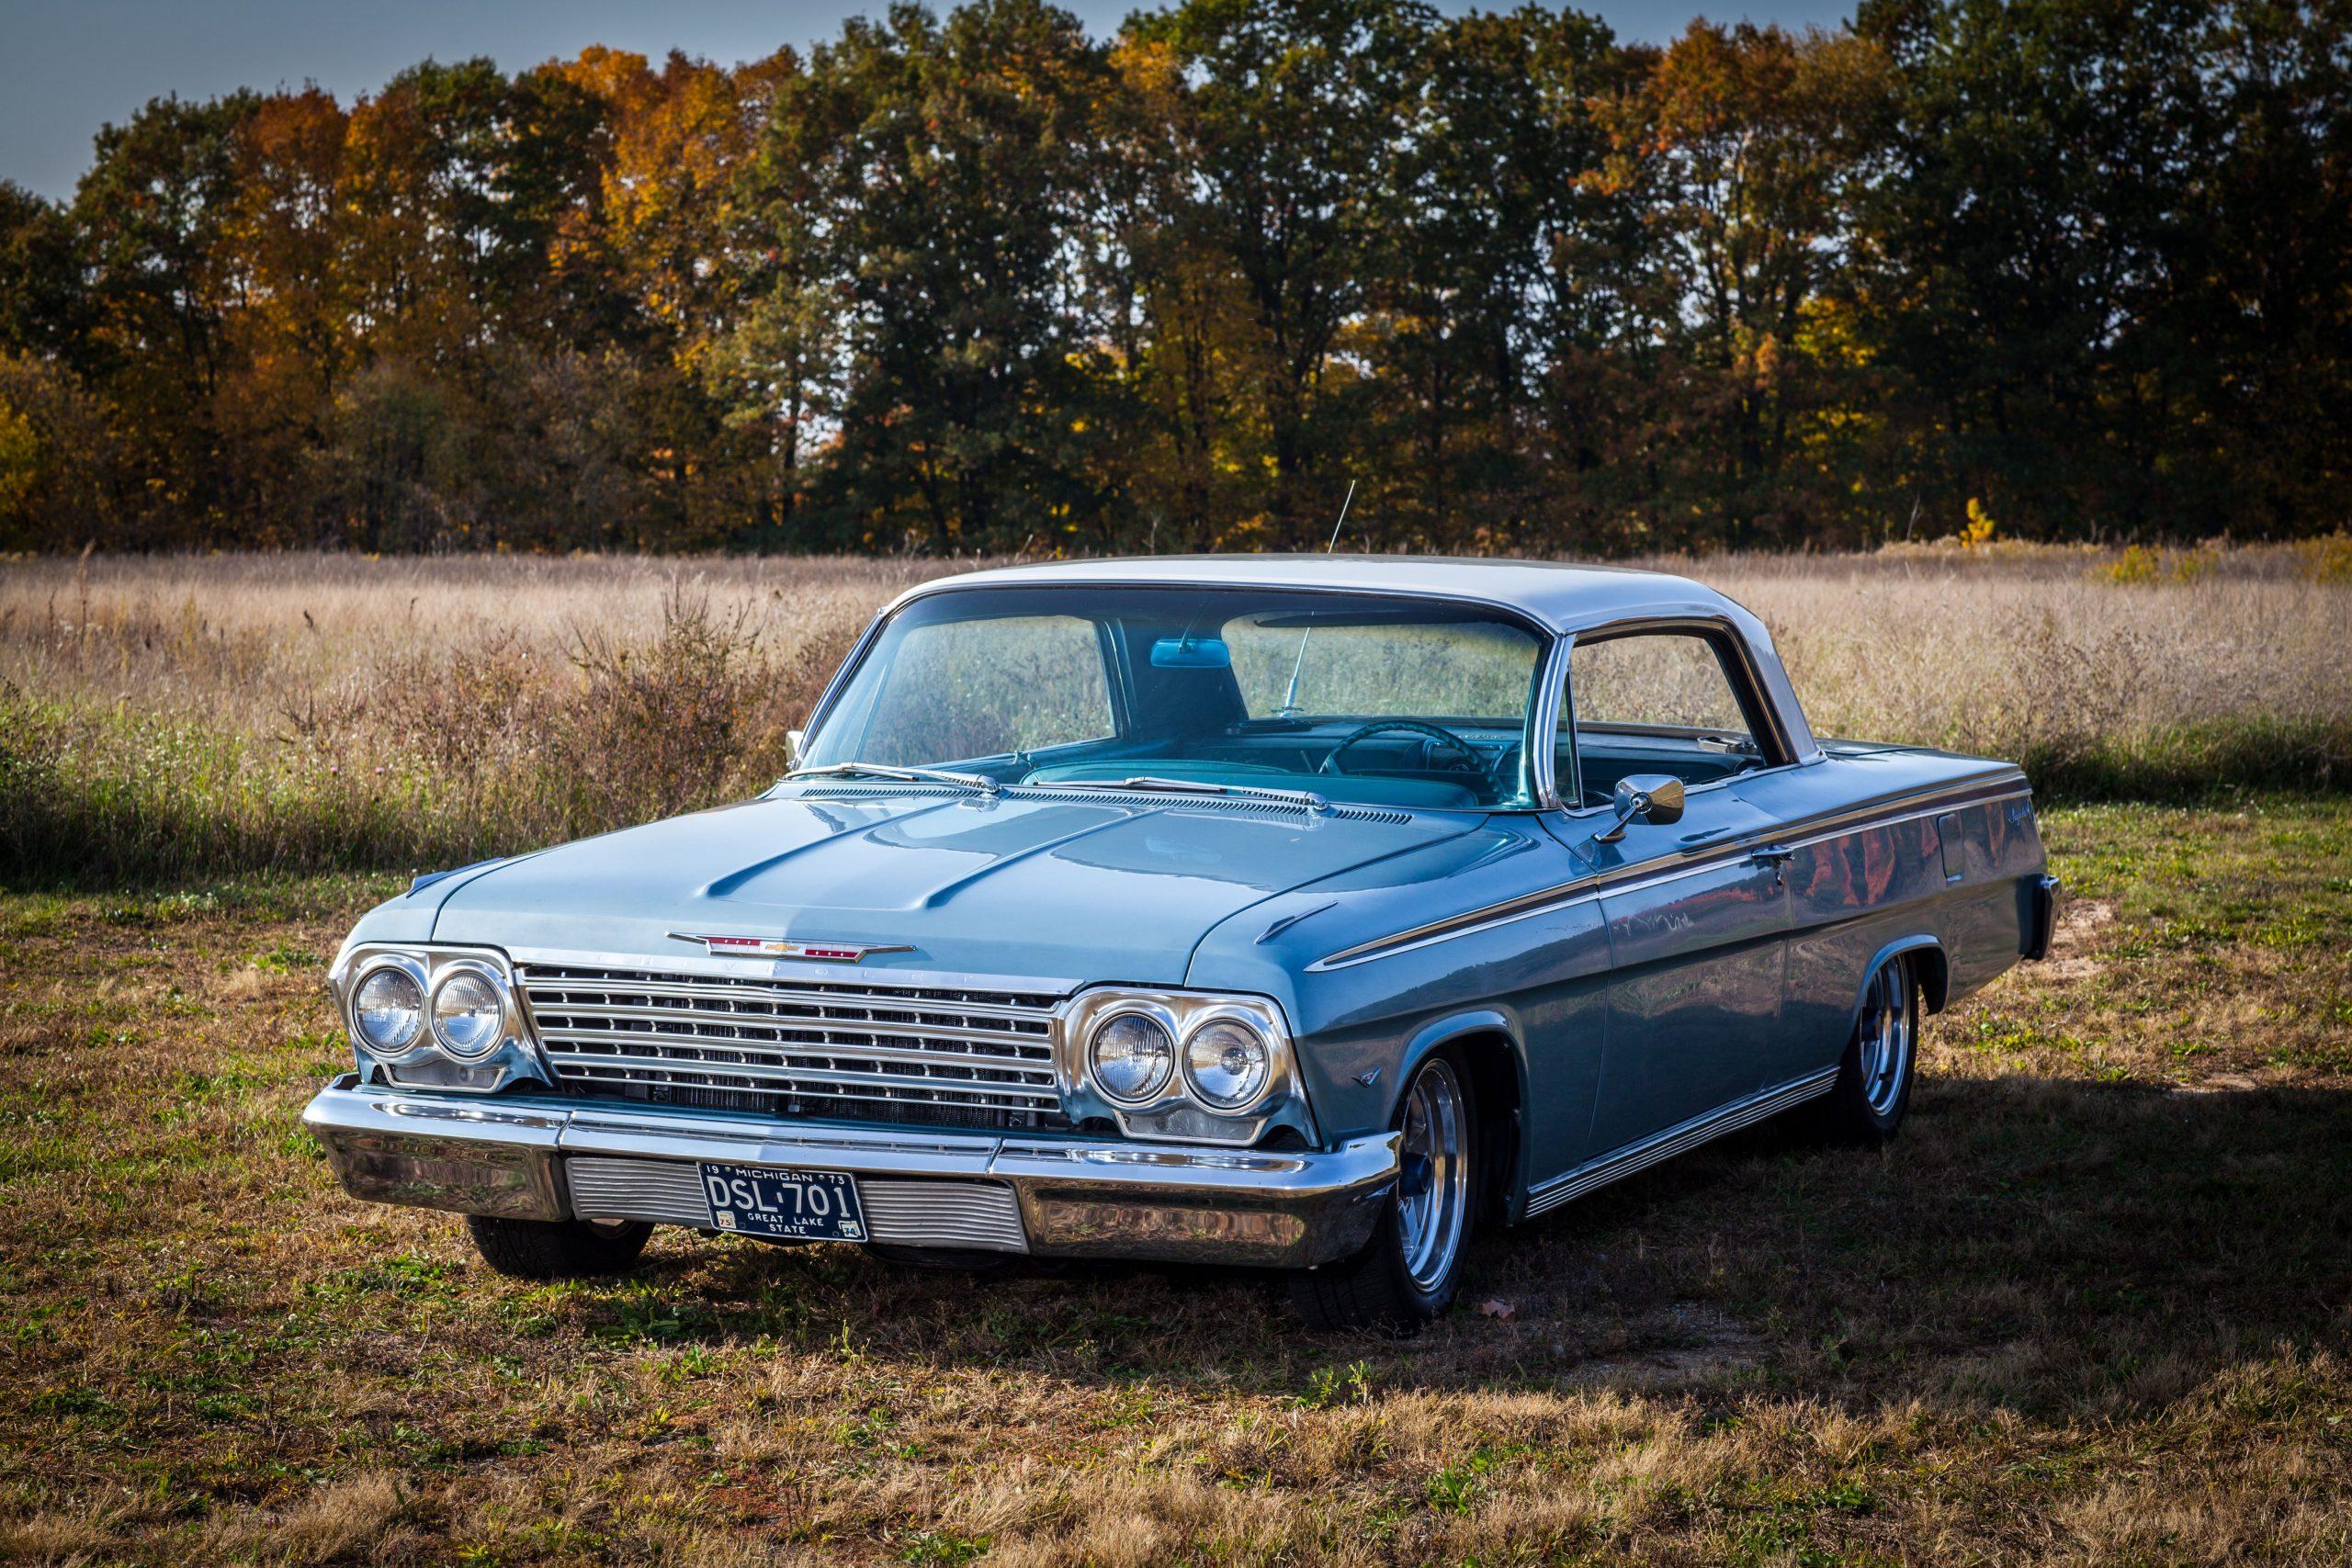 Jason Prince - 1962 Chevrolet Impala - full drivers side 2